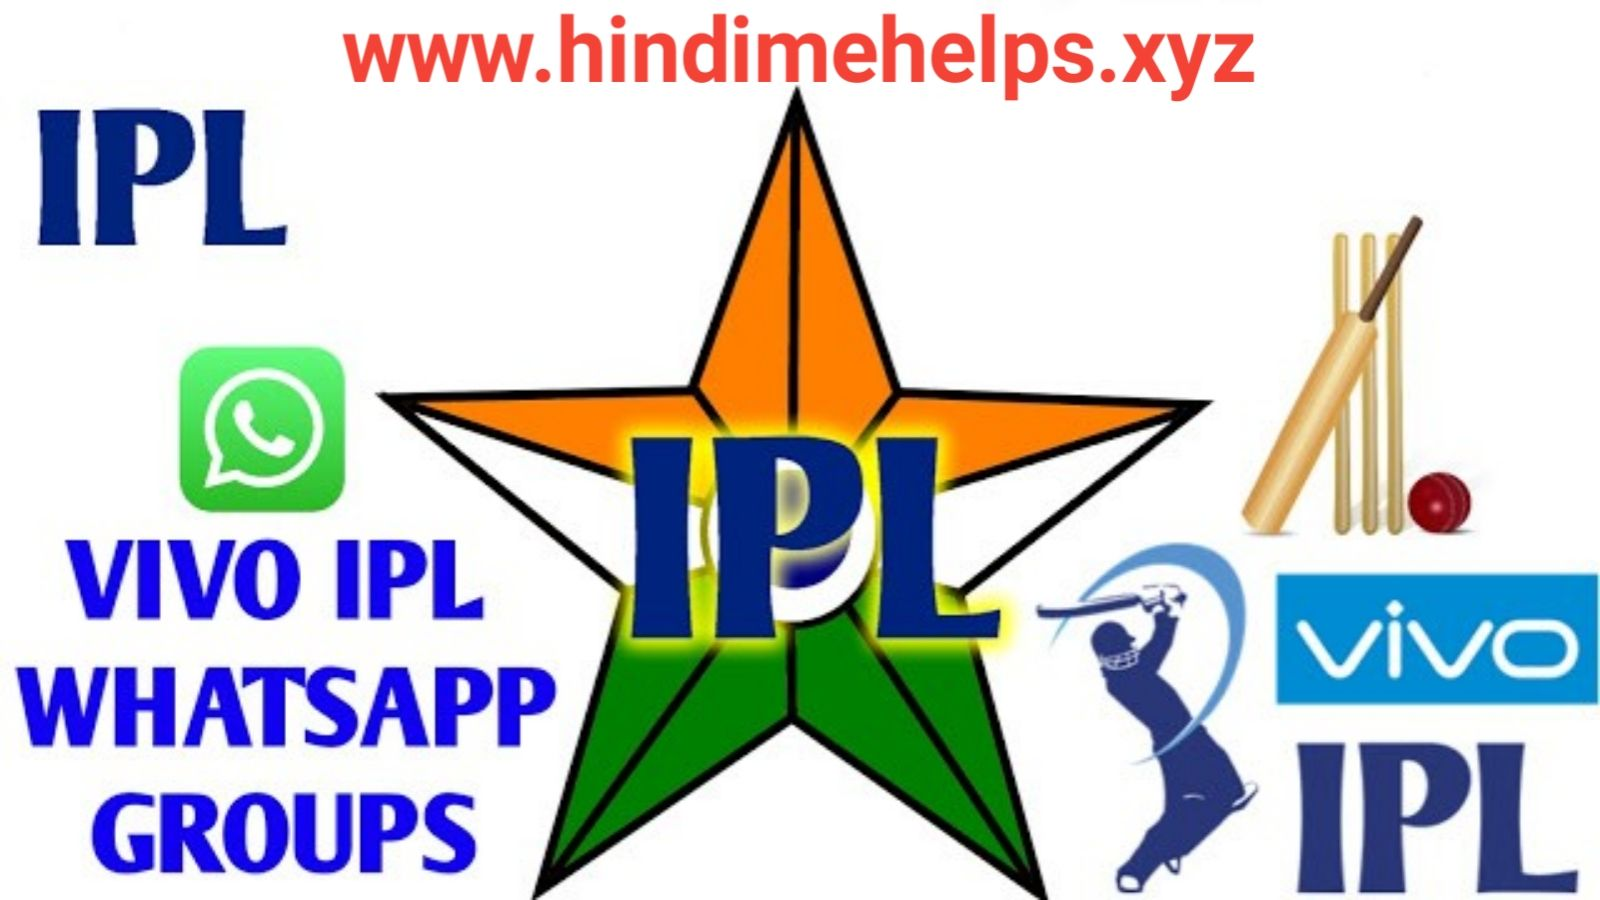 Vivo IPL(Indian Premier League) Whatsapp Group Join Link